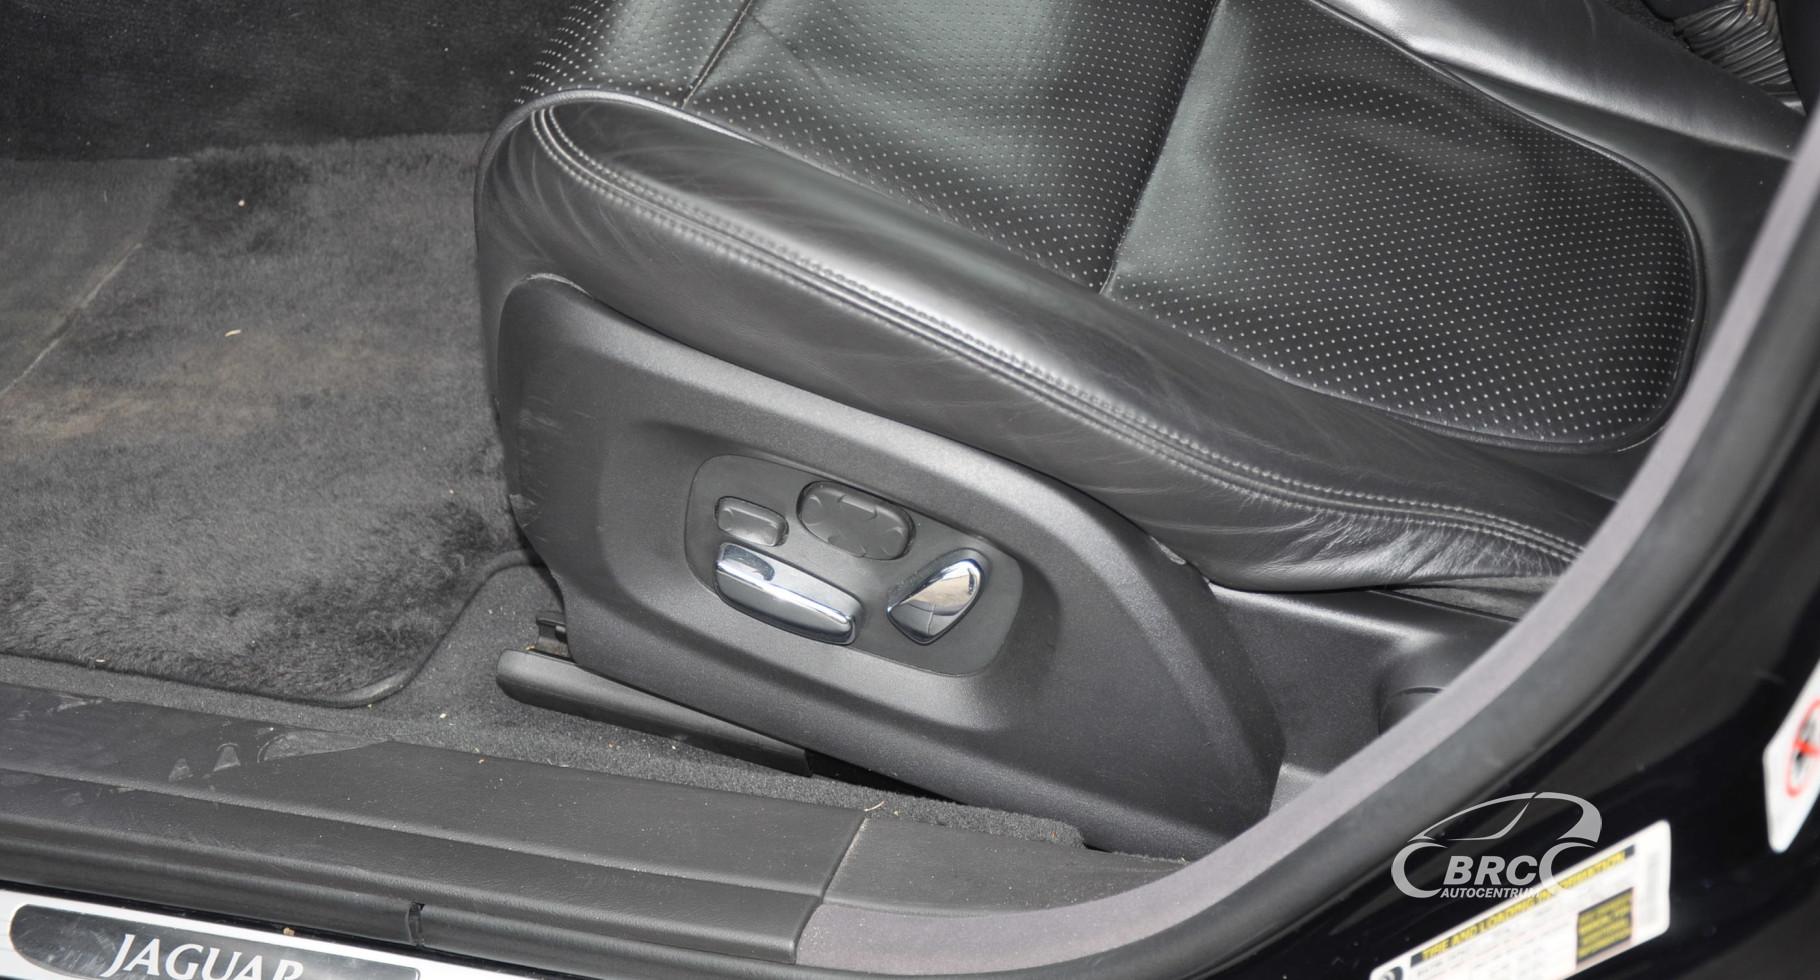 Jaguar XJ 4.2i V8 Vanden Plas Automatas